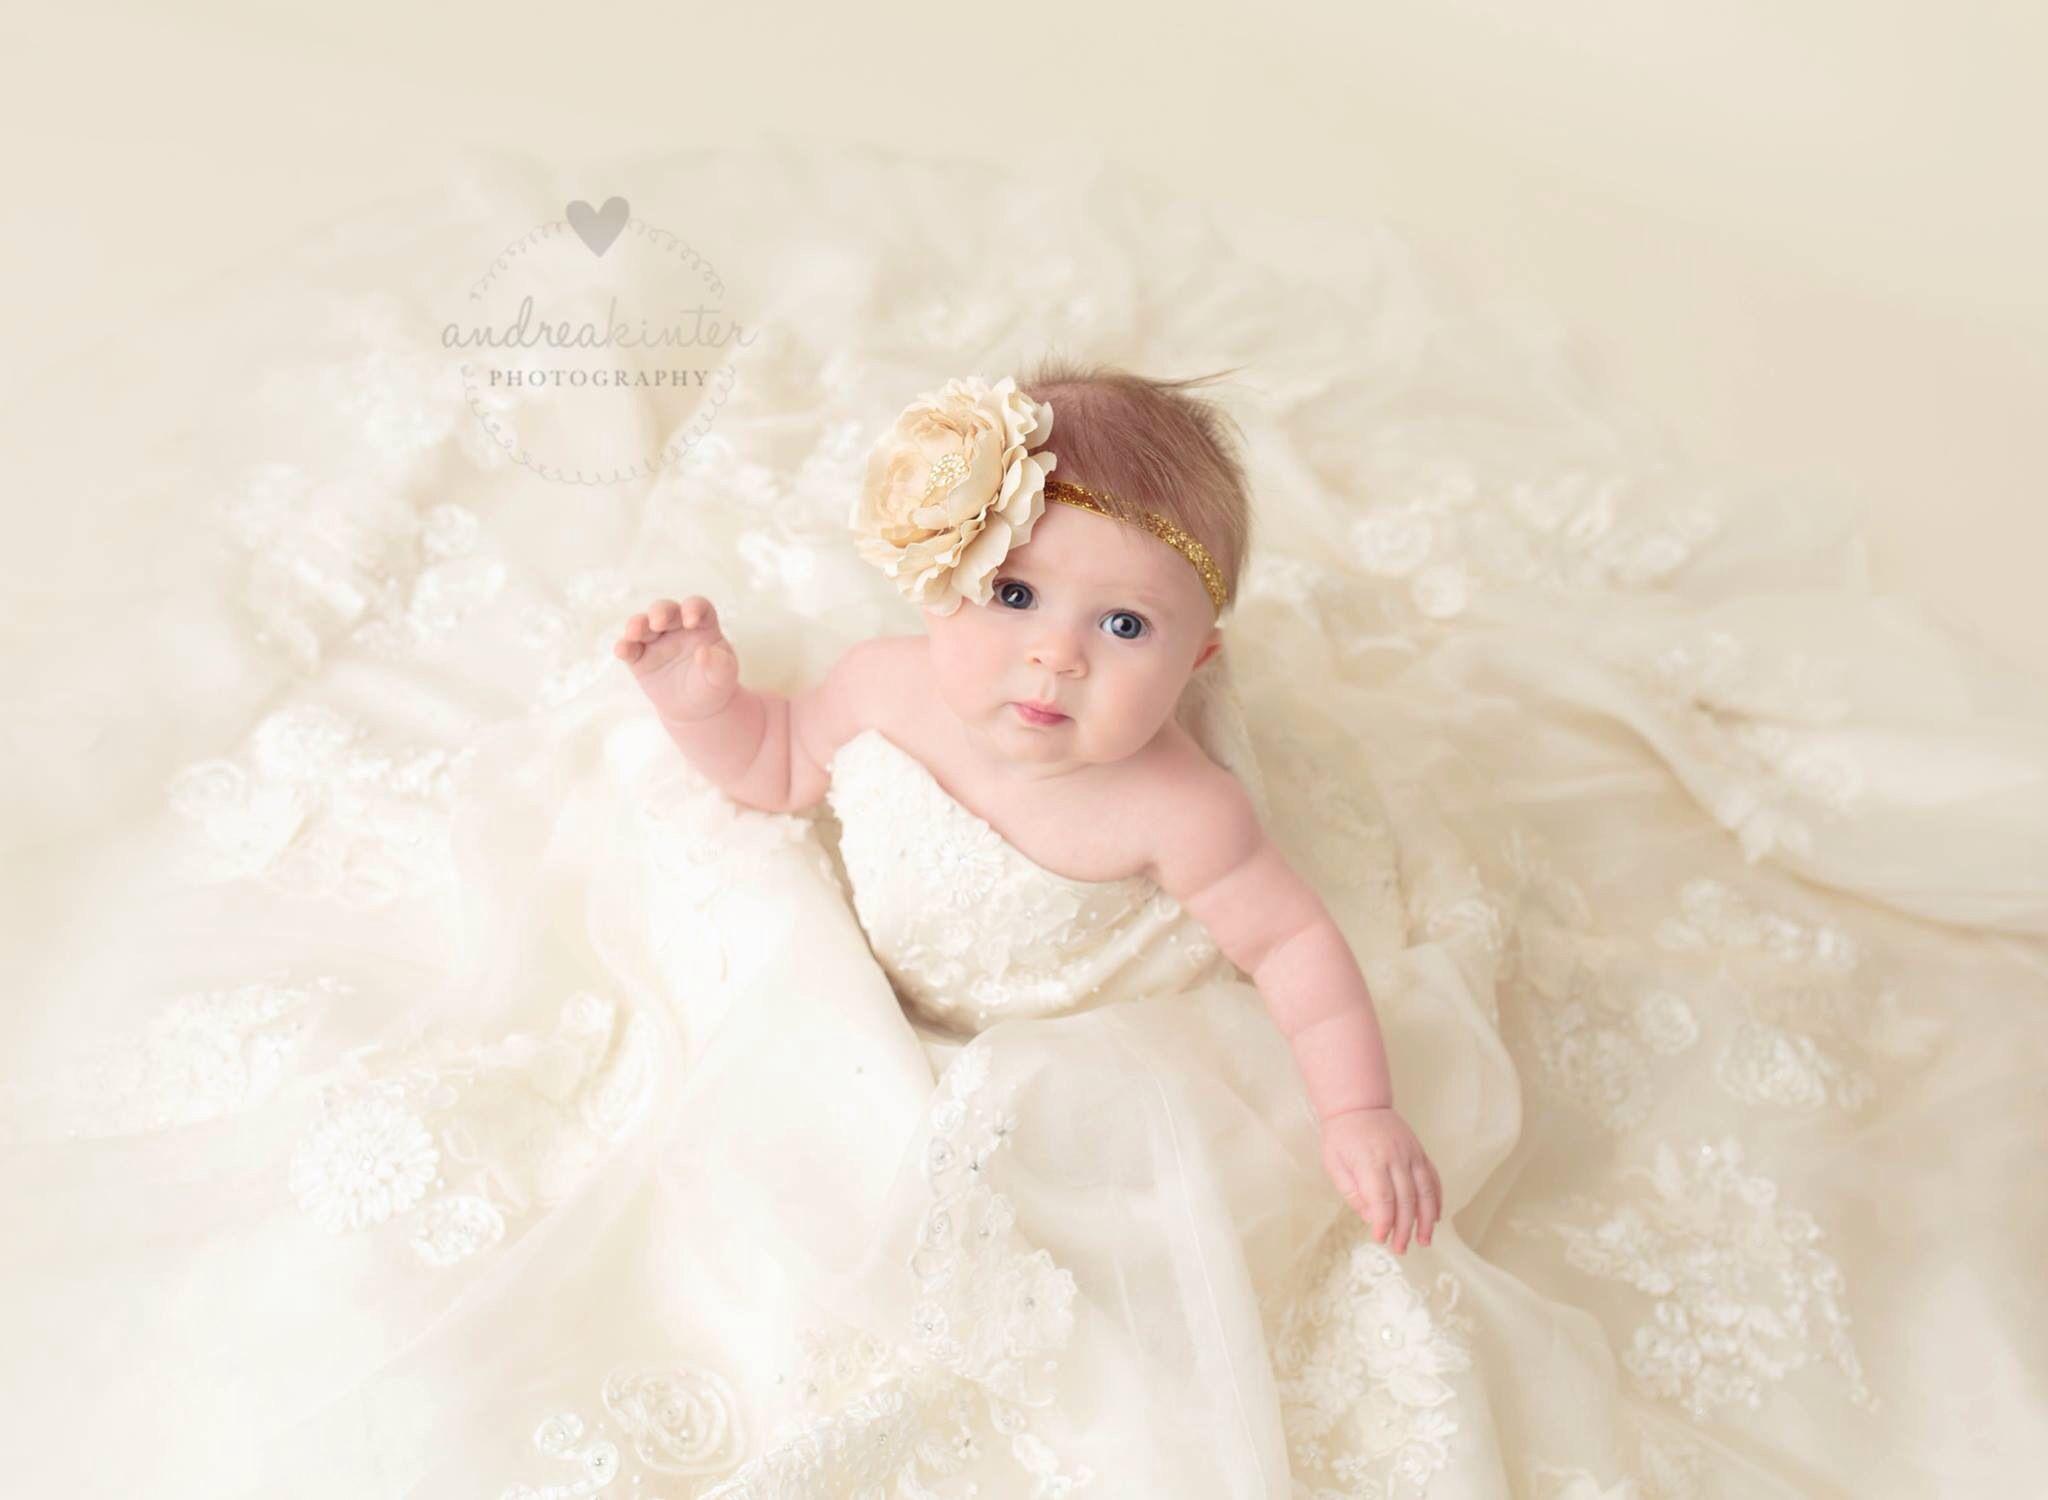 Baby Girl In Mom S Wedding Dress 3 Baby Wedding Outfit Girl Baby Girl Wedding Dress Old Wedding Dresses